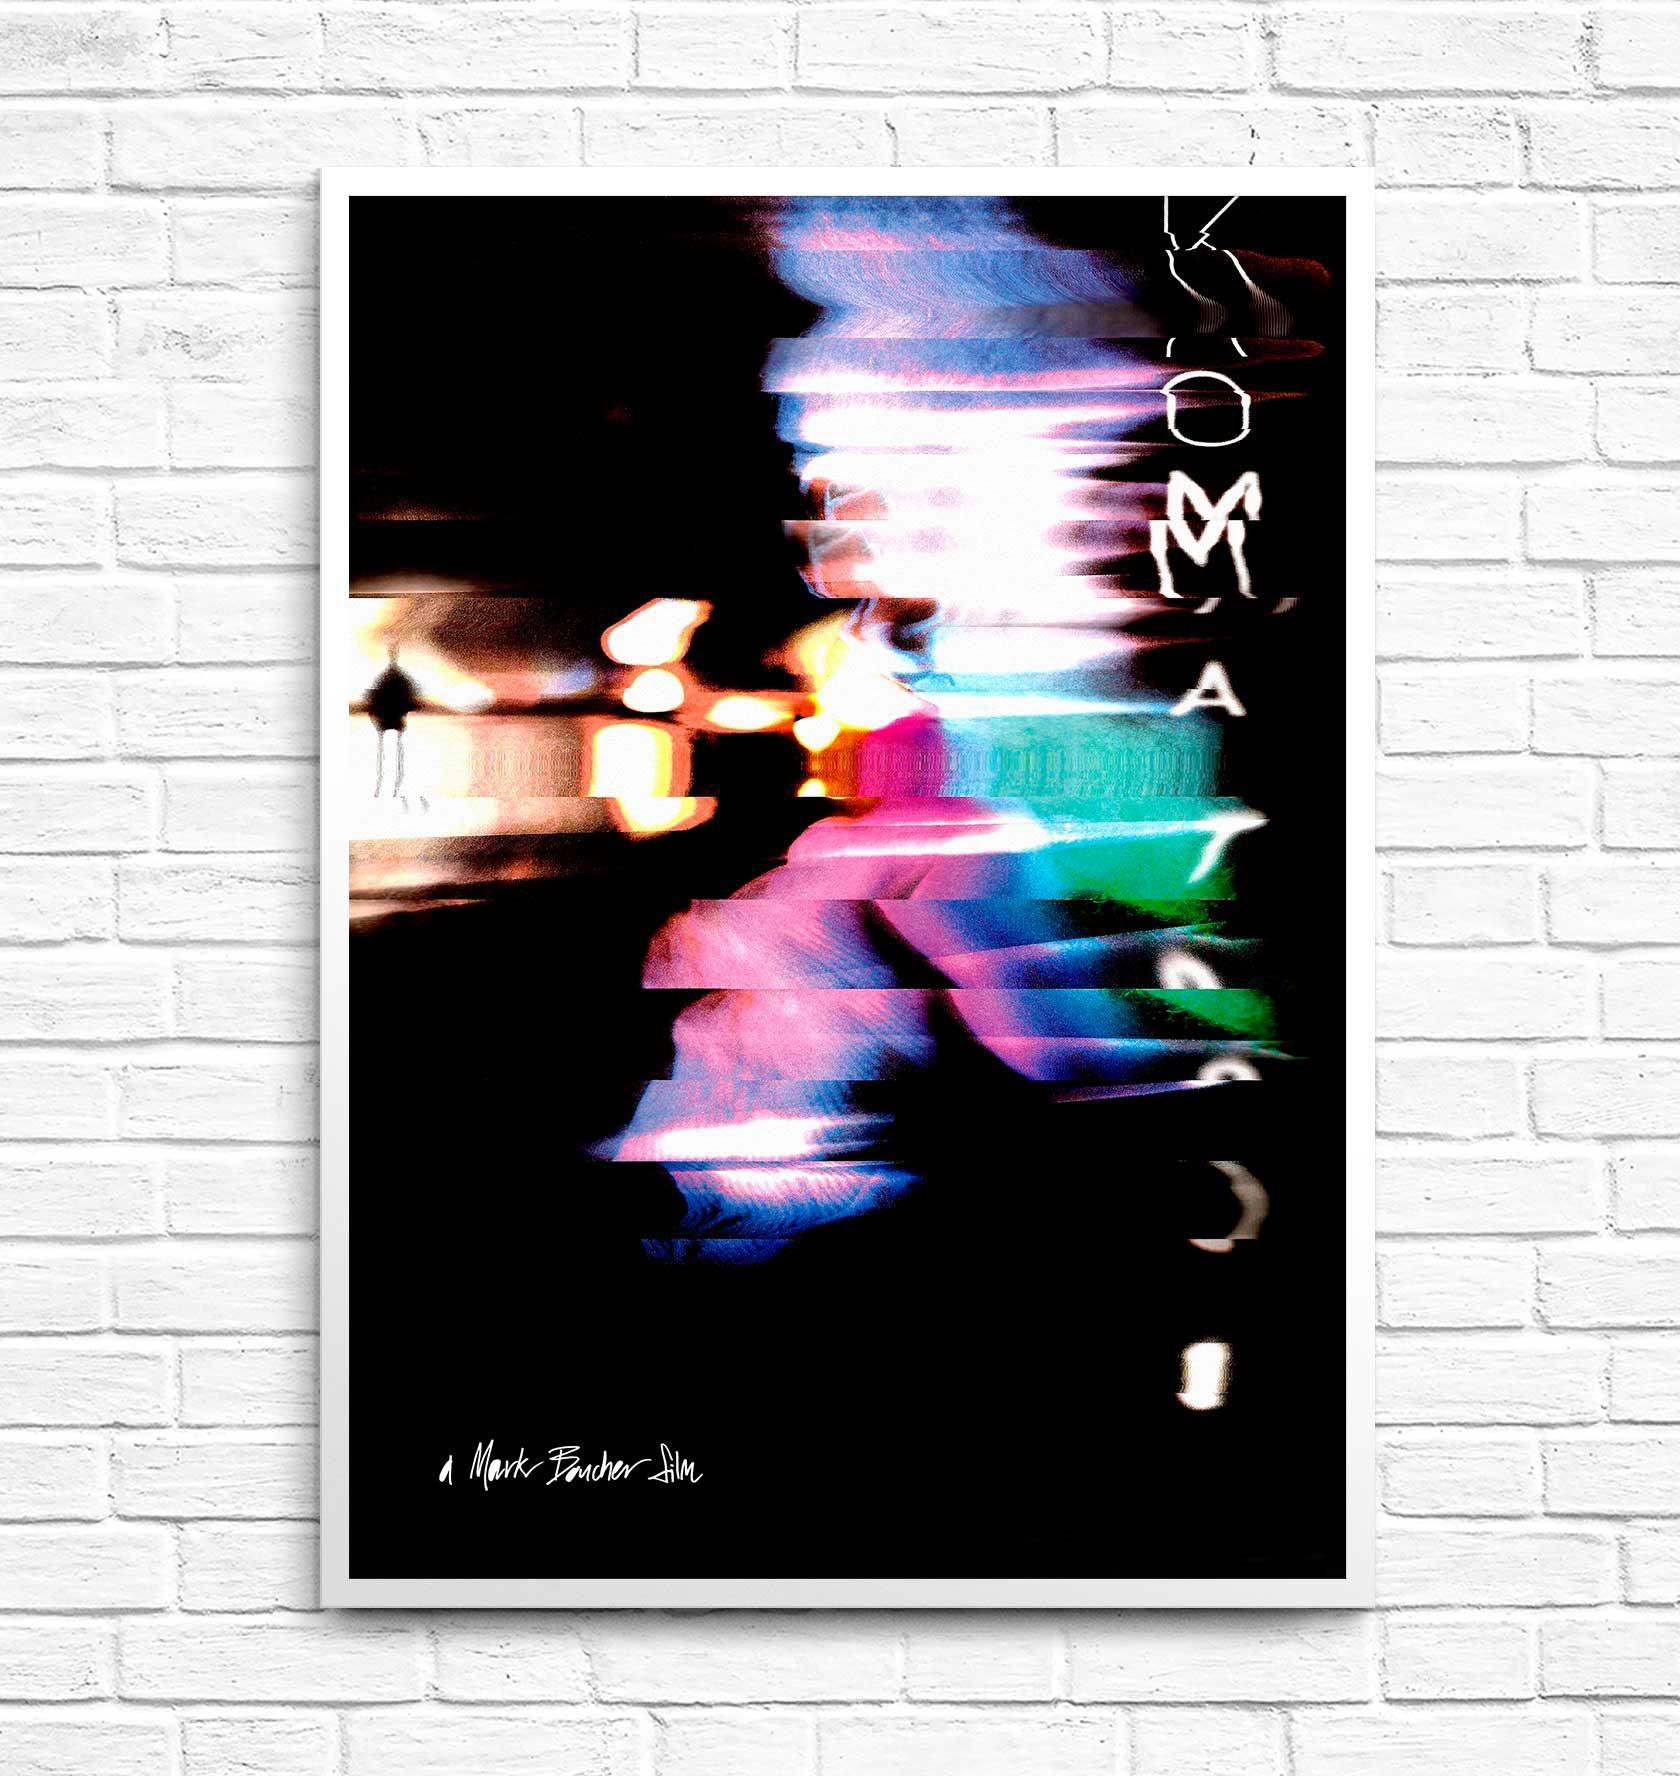 Komatose Film Poster by Furia